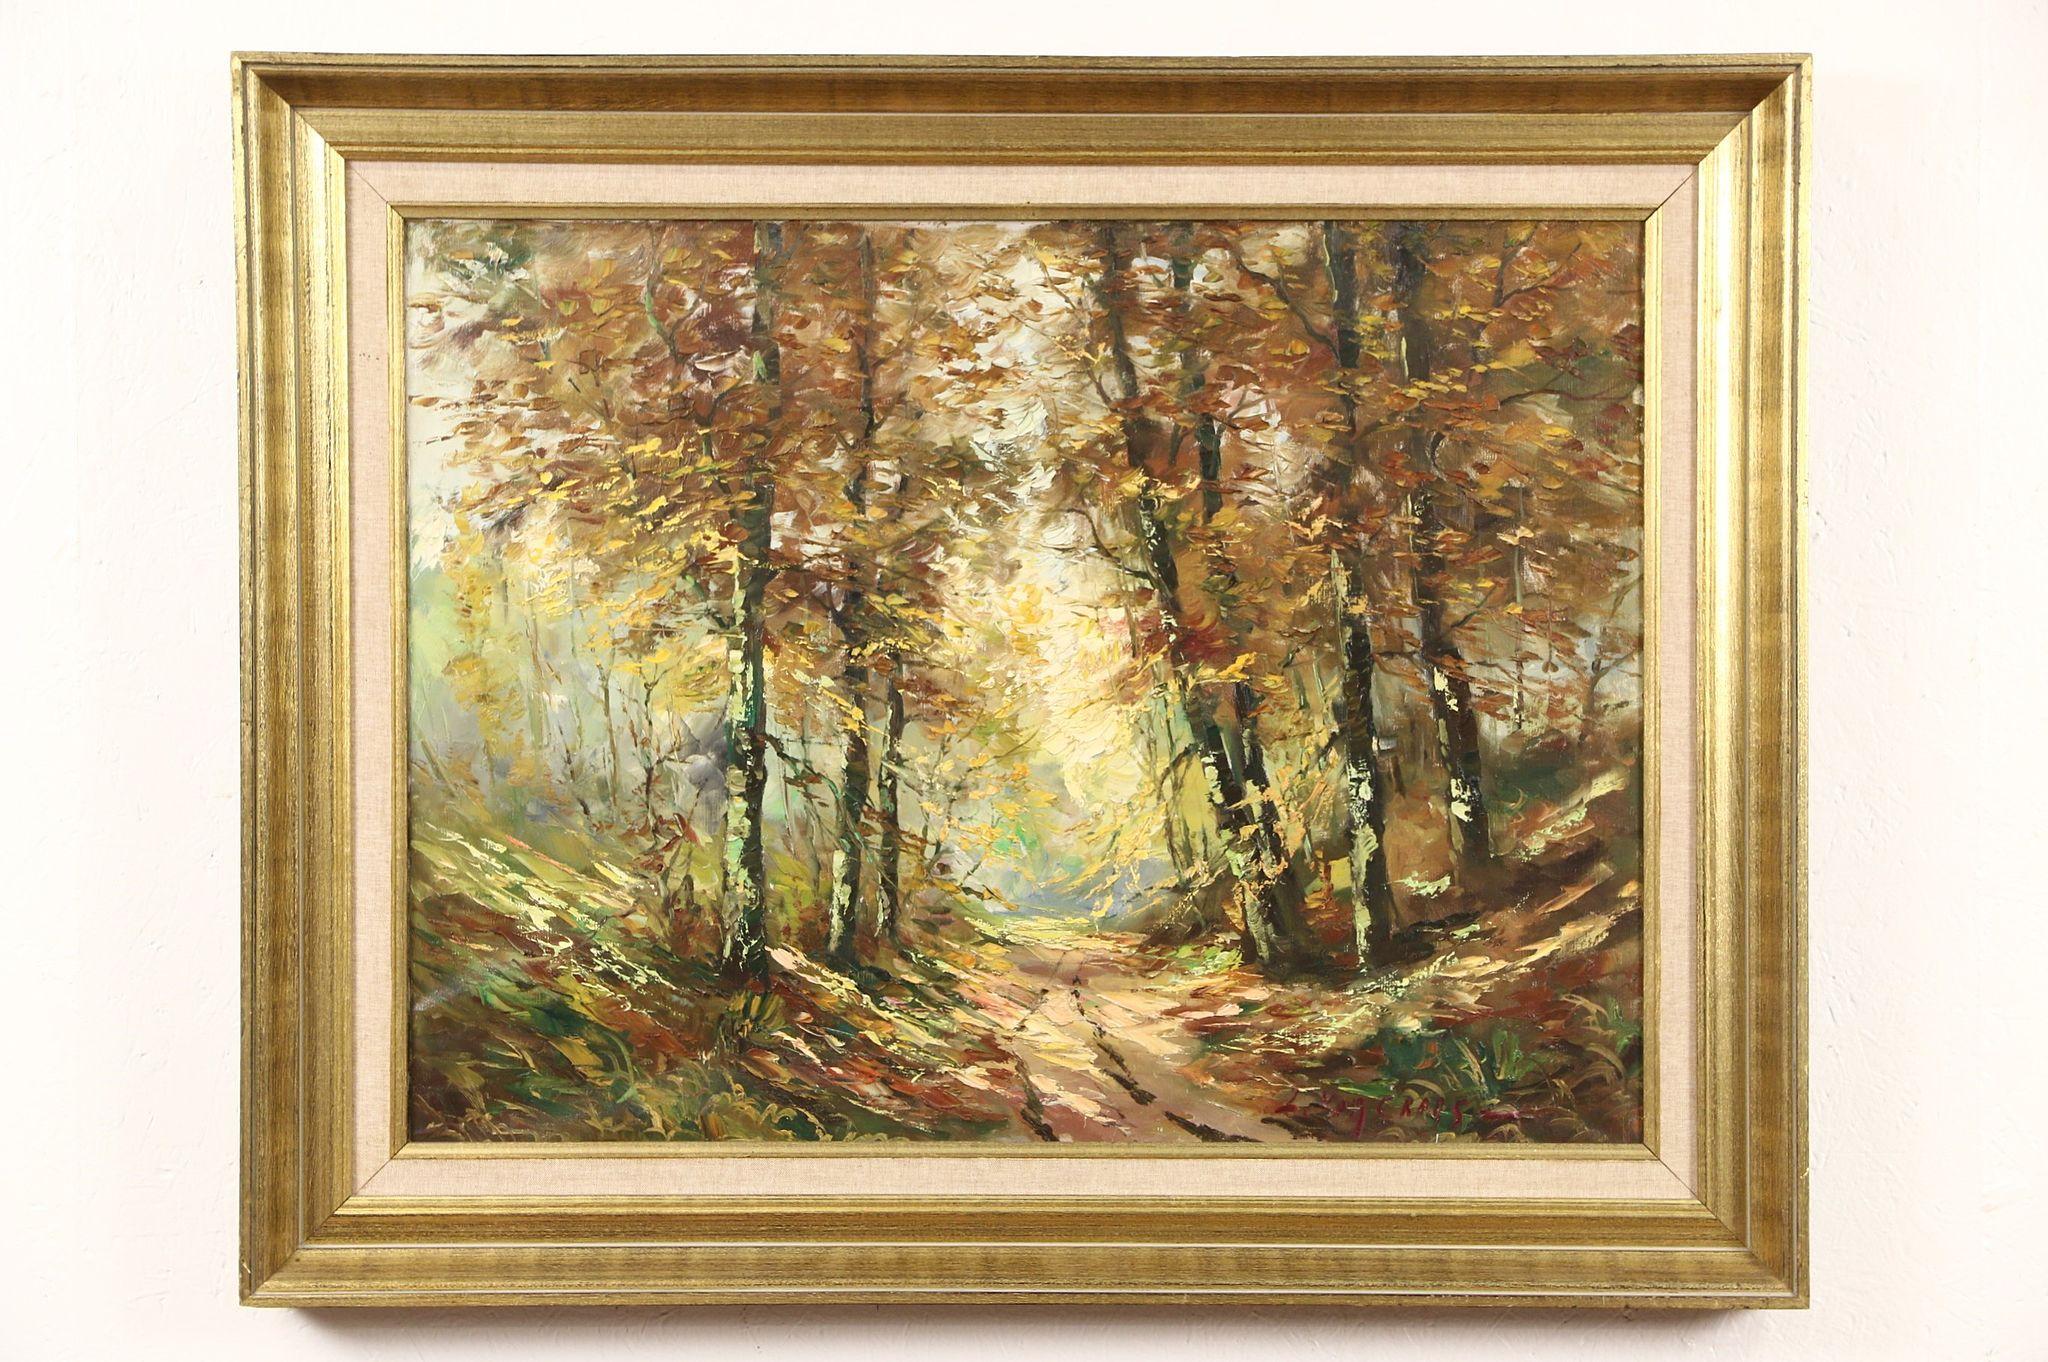 SOLD - Autumn Forest Path, Original Scandinavian Oil Painting ...